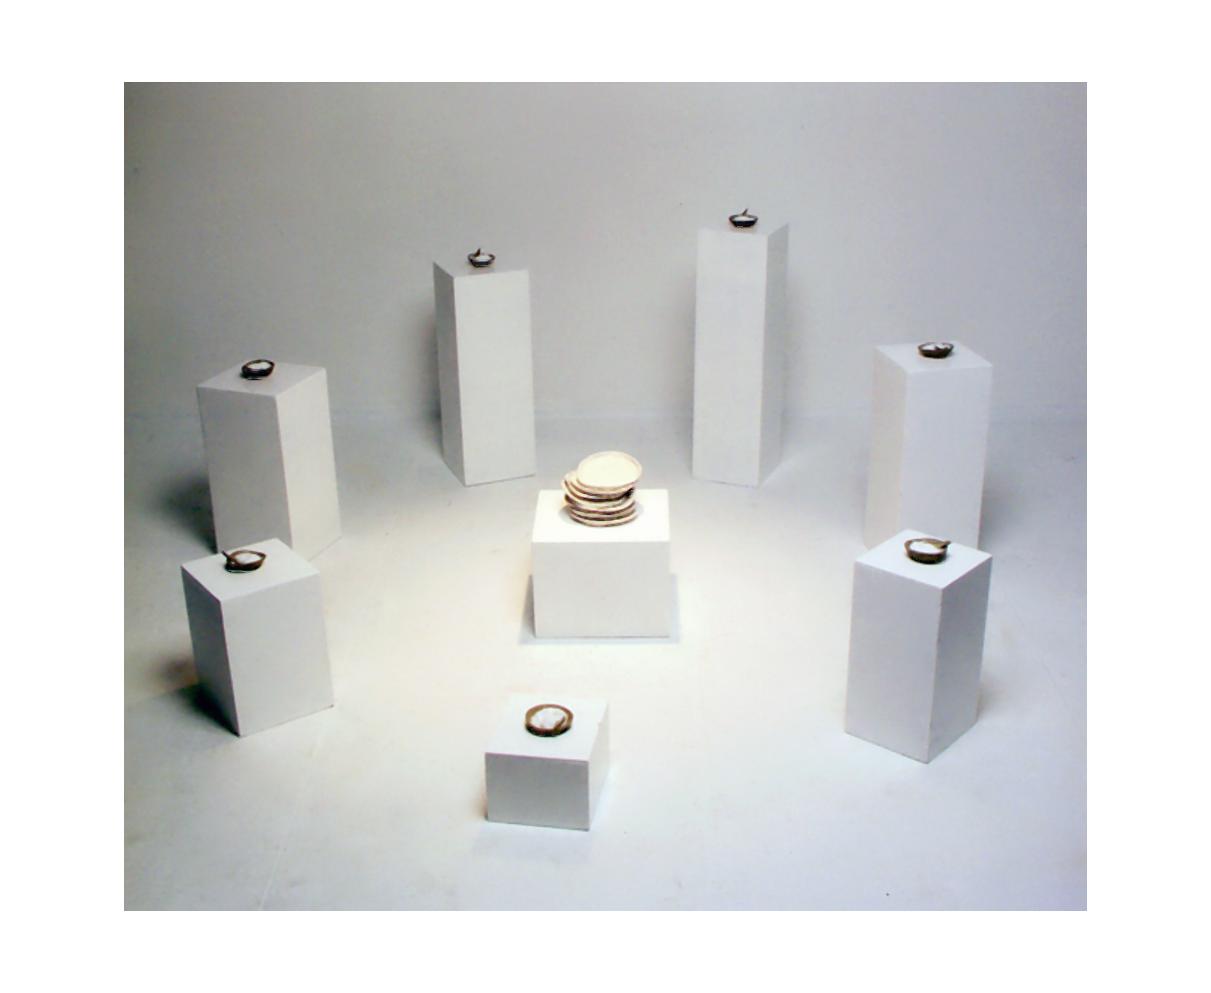 8th  Triennial of Croatian Sculpture, The Glyptotheque, Croatian Academy of Sciences and Arts, Zagreb, Croatia